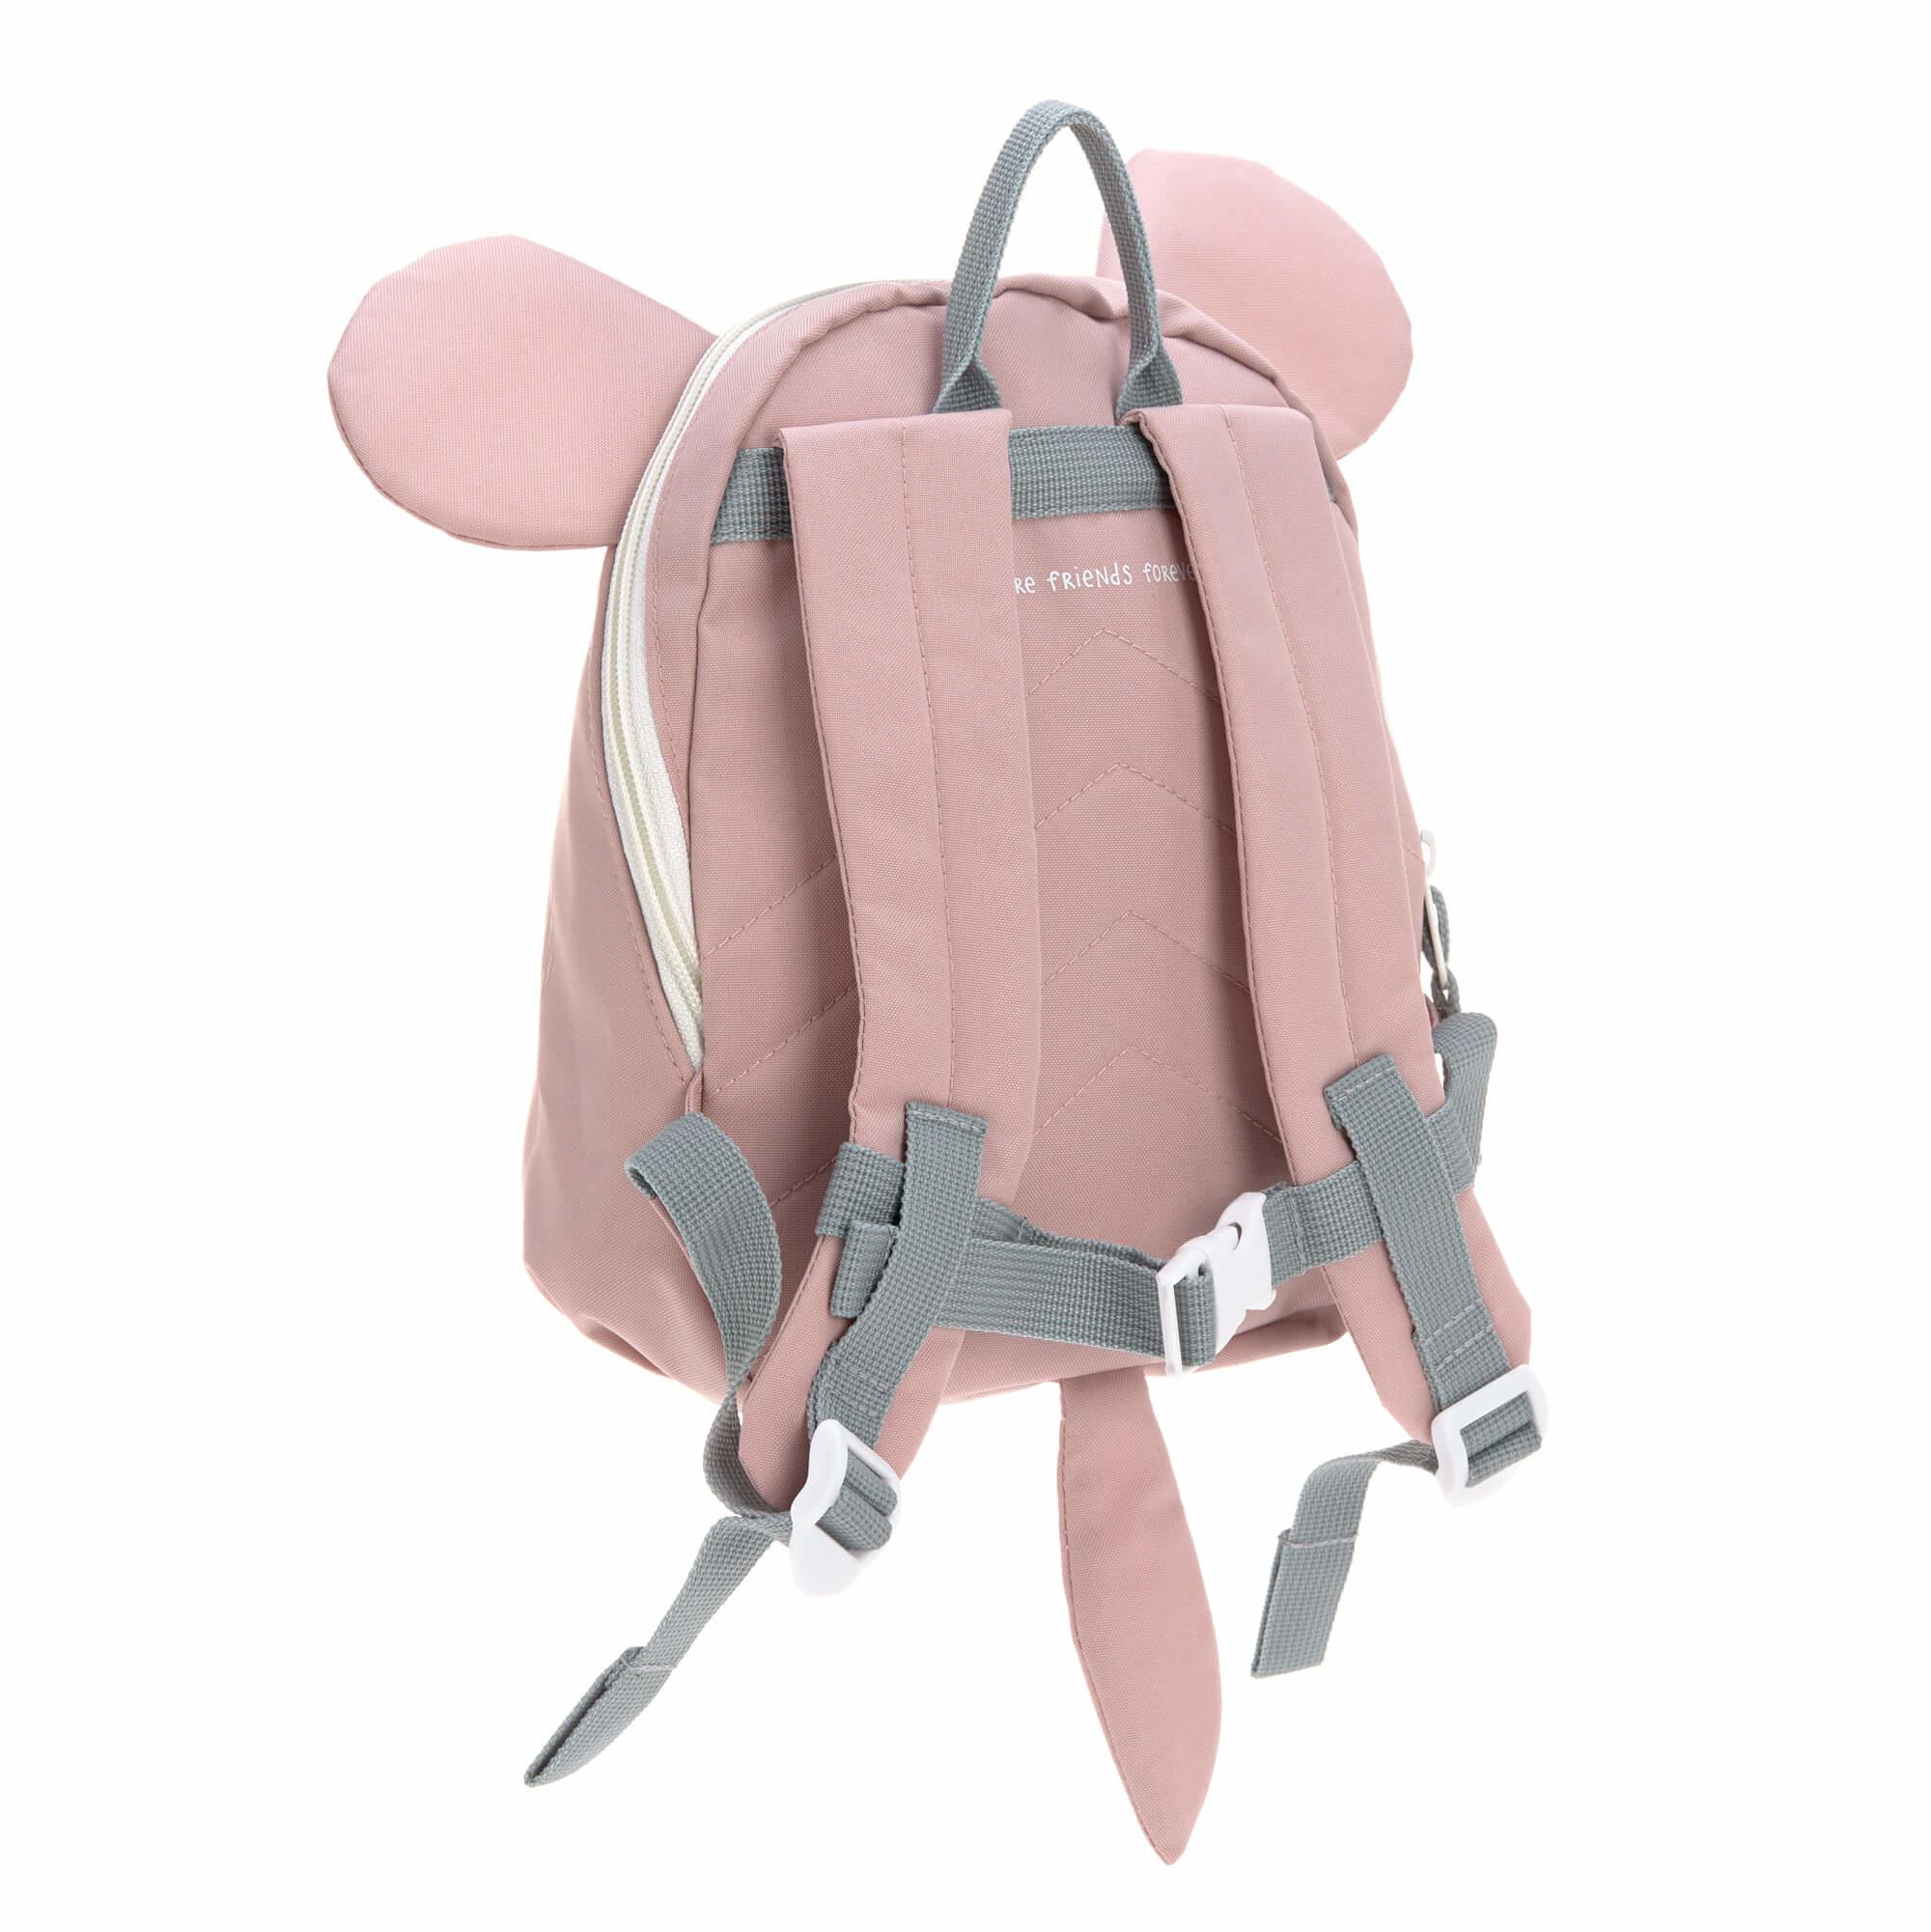 Lässig LÄSSIG tiny backpack about friends chinchilla